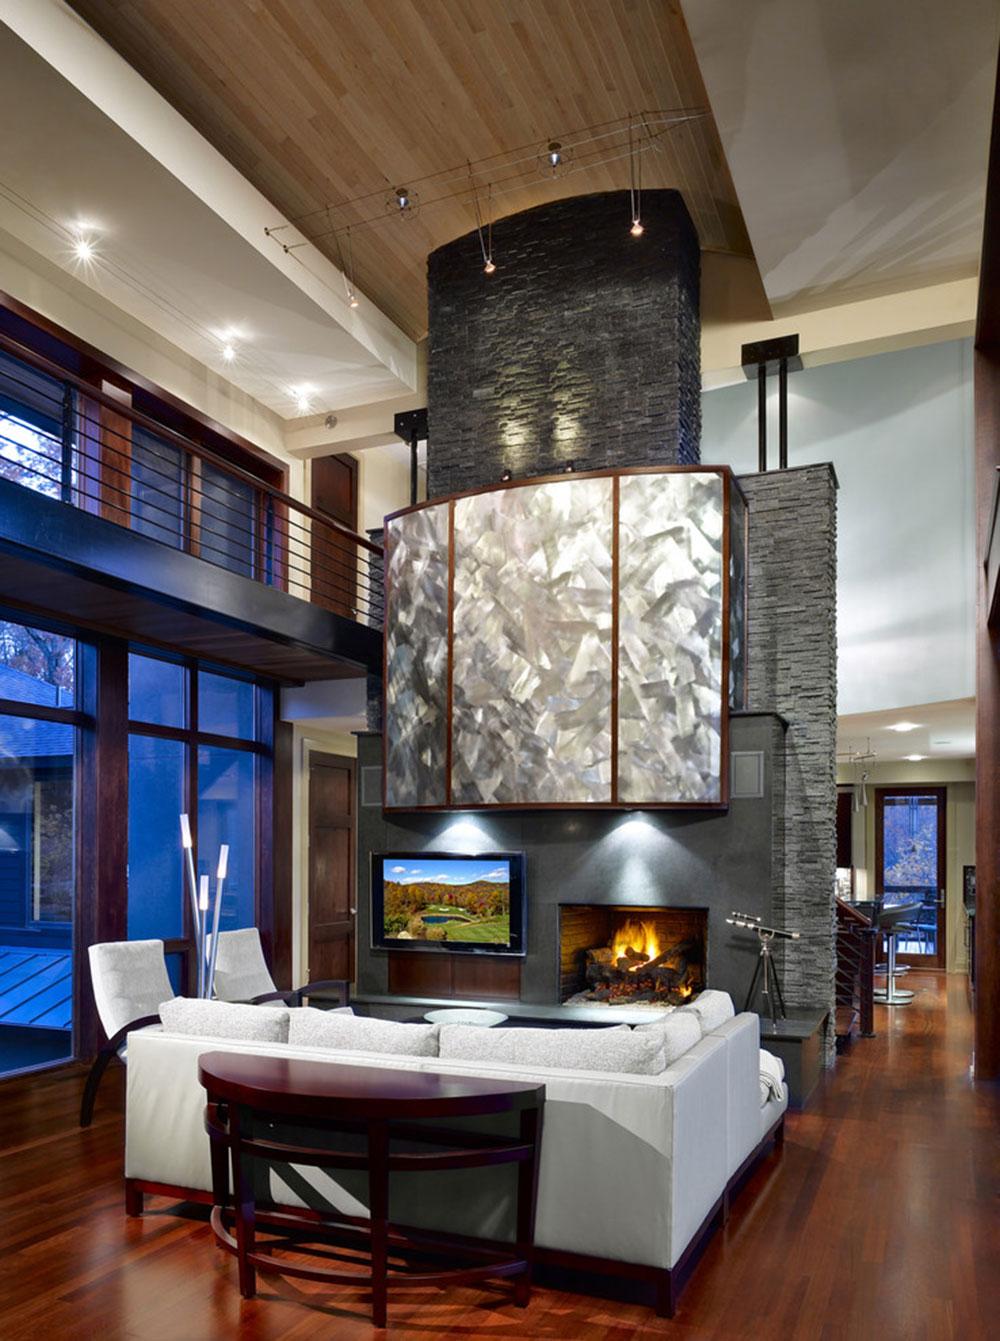 Amazing interiors with shades of gray10 Amazing interiors with shades of gray